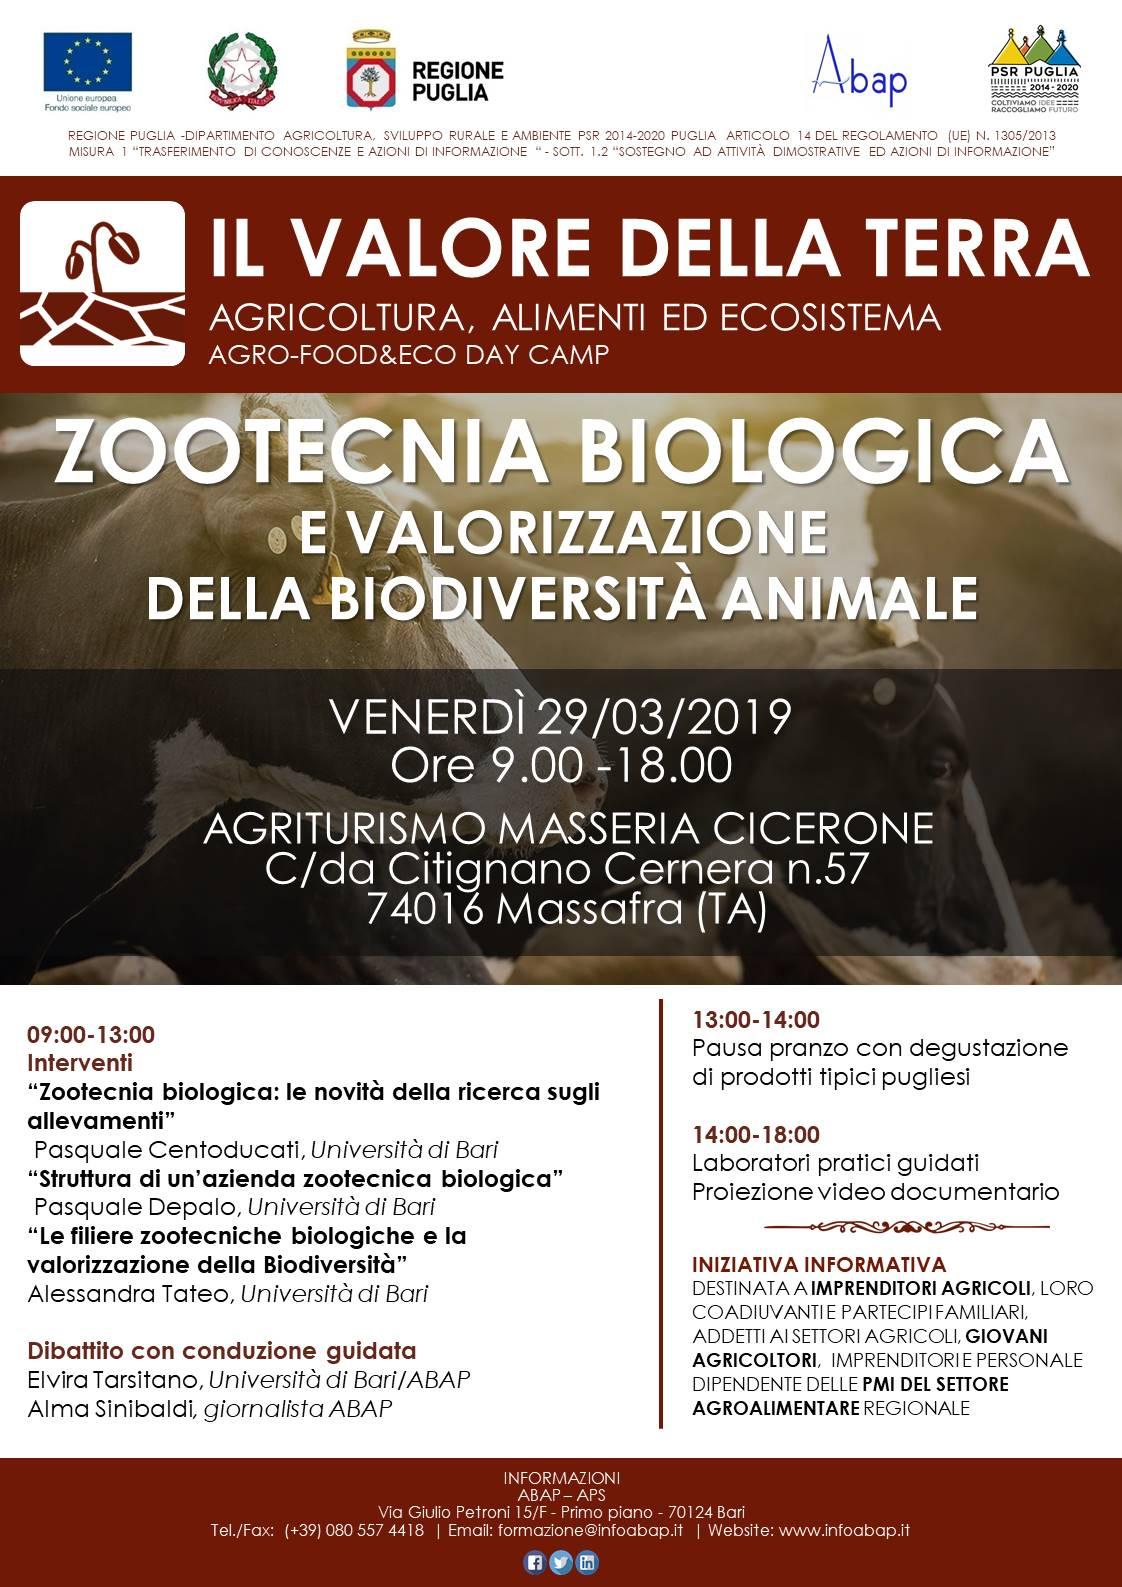 locandina_mis1-sottomisura1.2_zootecnia-bio_29032019.1